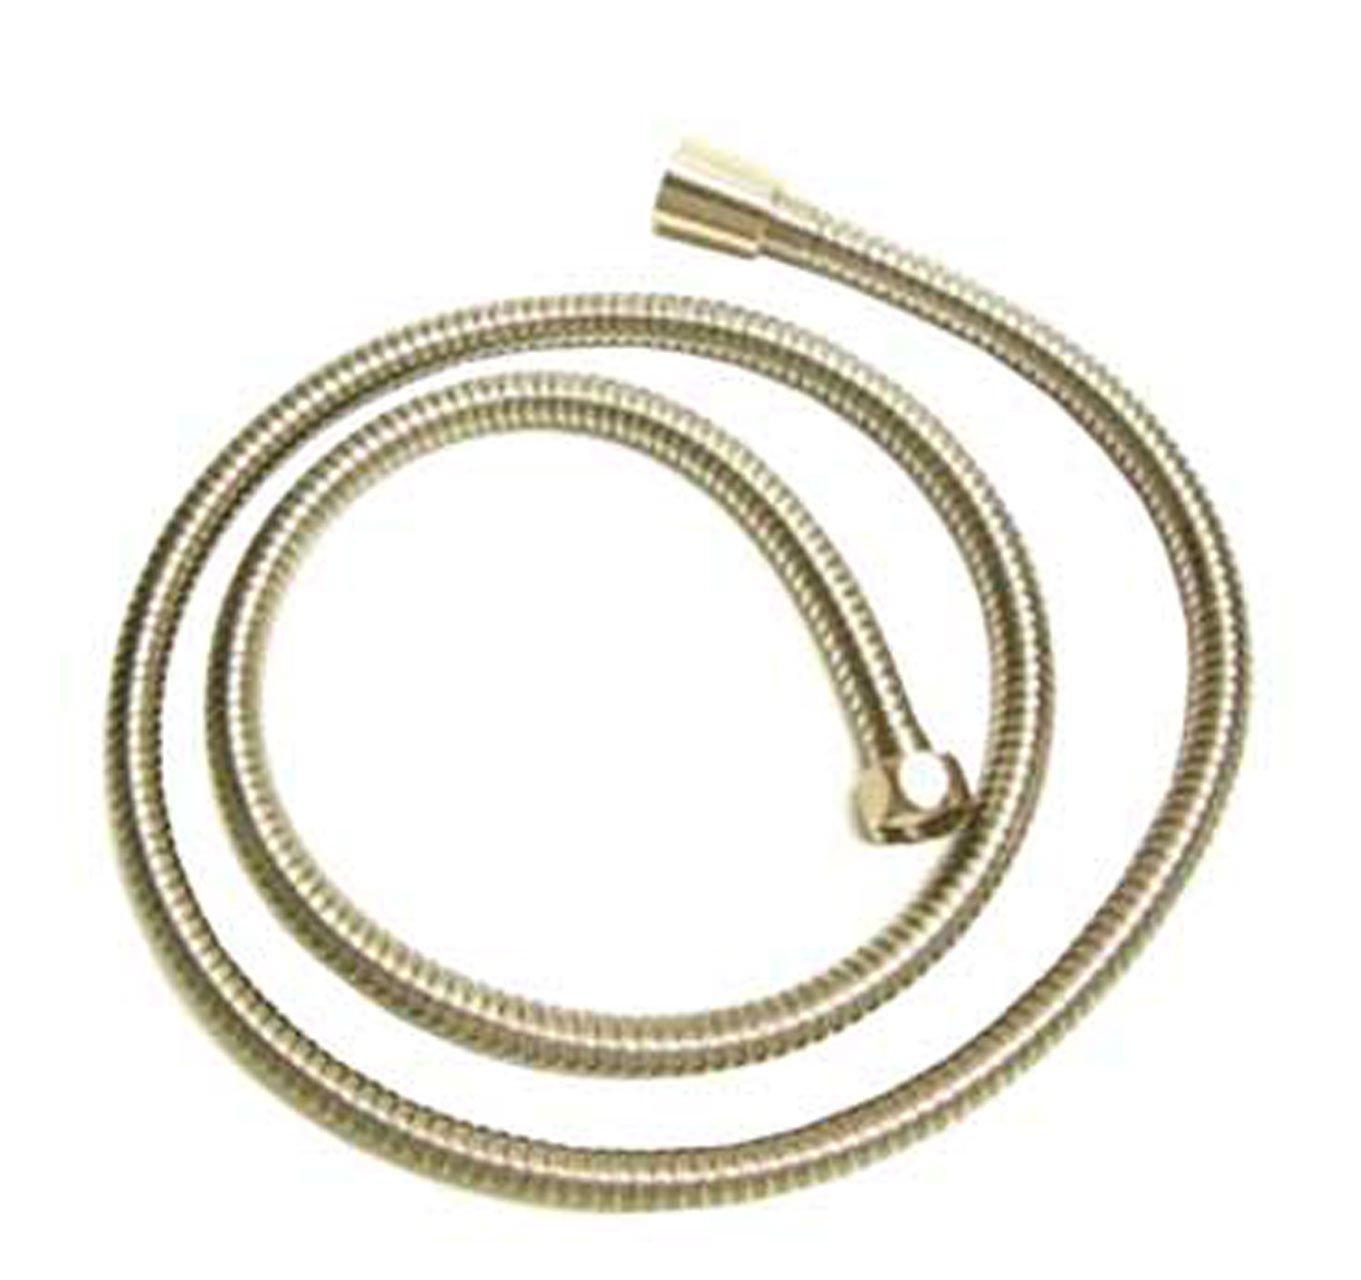 Whitehaus WH10301-POCH Brass 59-Inch Double Interlock Shower Hose, Polished Chrome